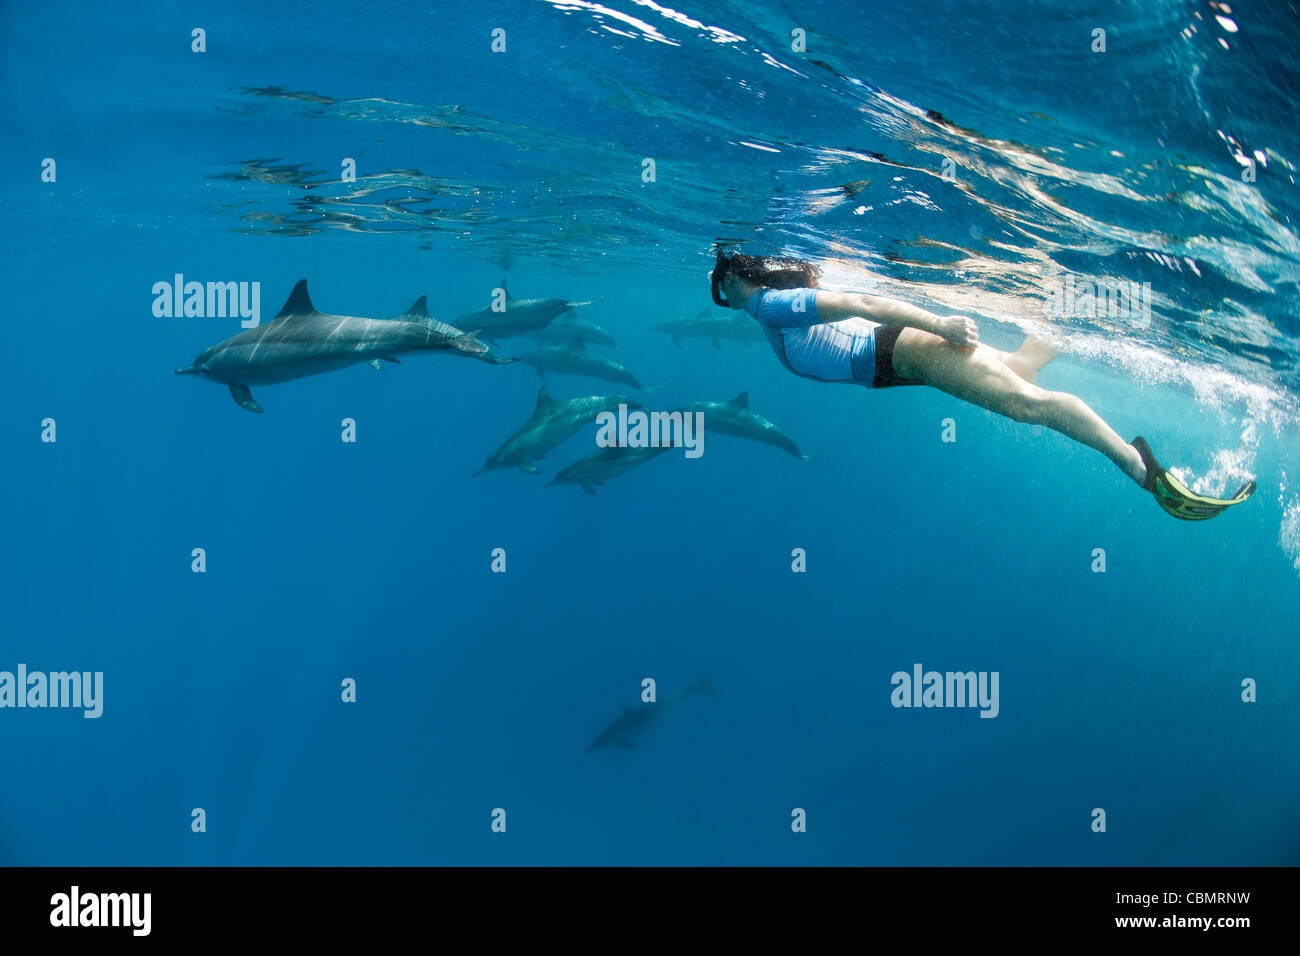 Schnorcheln mit Delfinen, Stenella Longirostris, Shaab Rumi, Rotes Meer, Sudan Stockbild